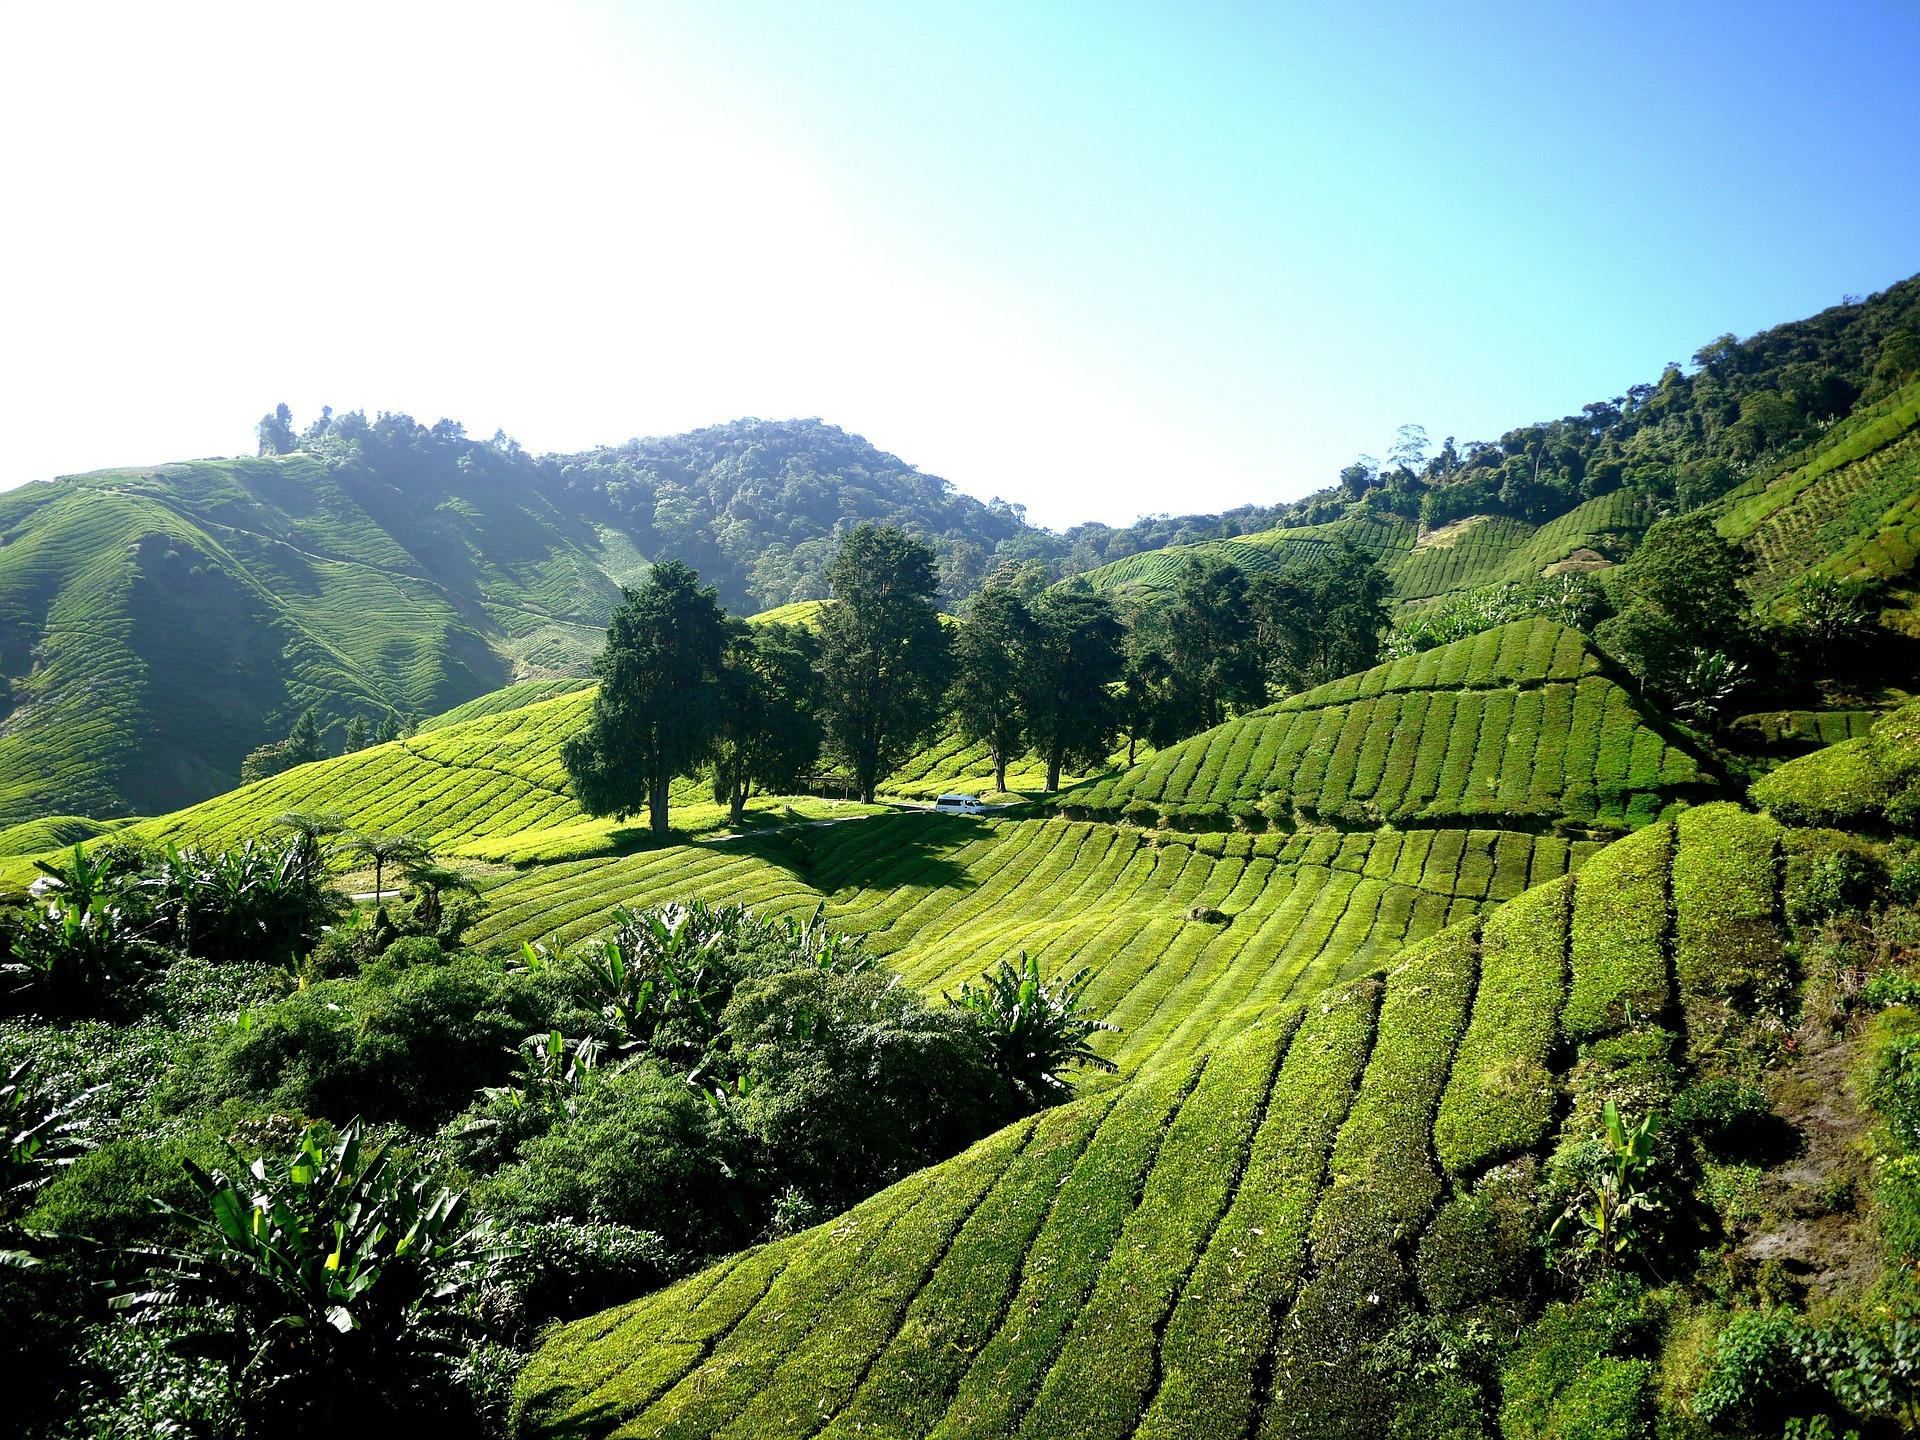 maleisie tea-plantation-261515_1920.jpg